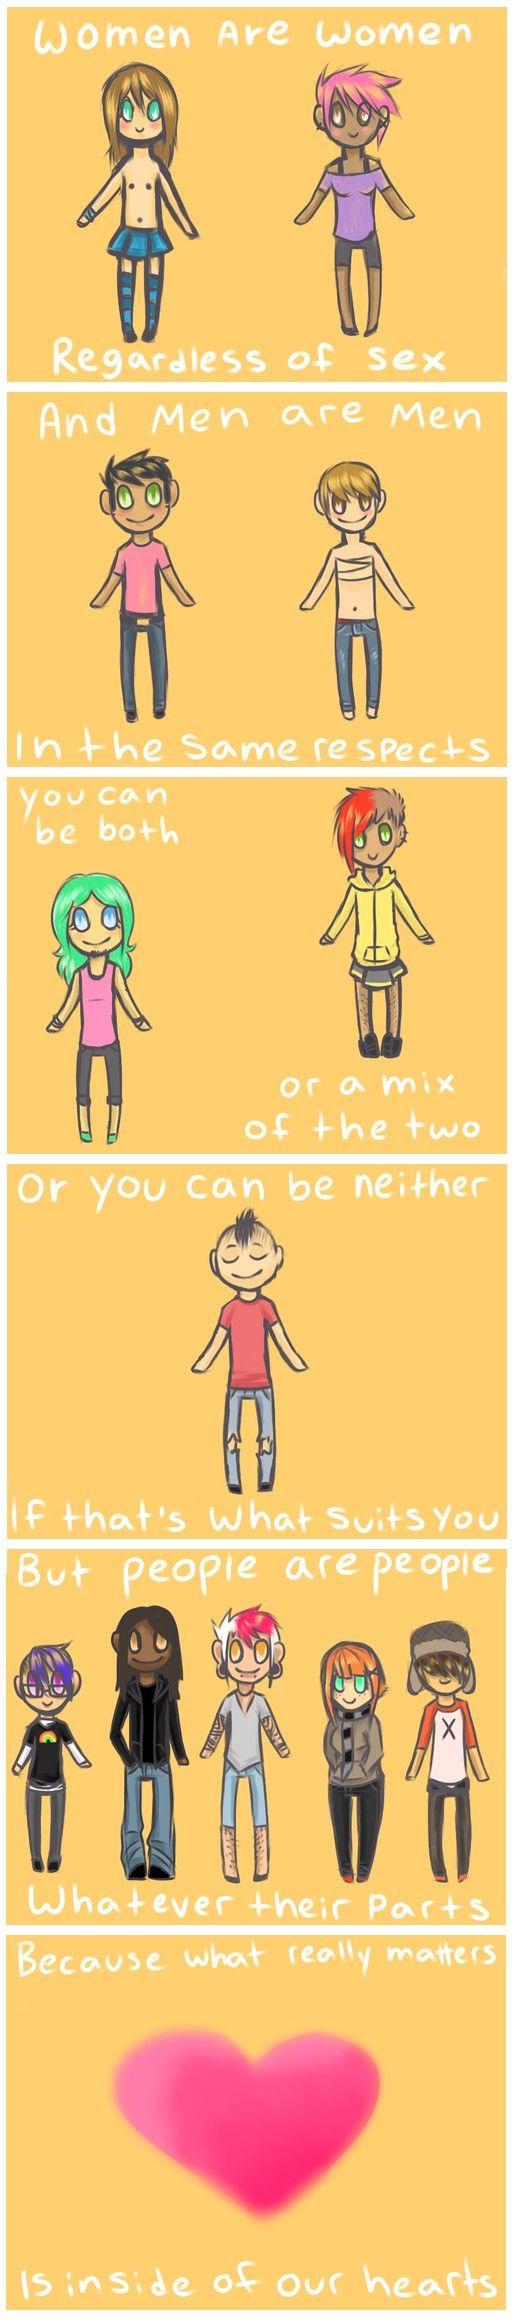 Cute and heartwarming gender poem.  :-)